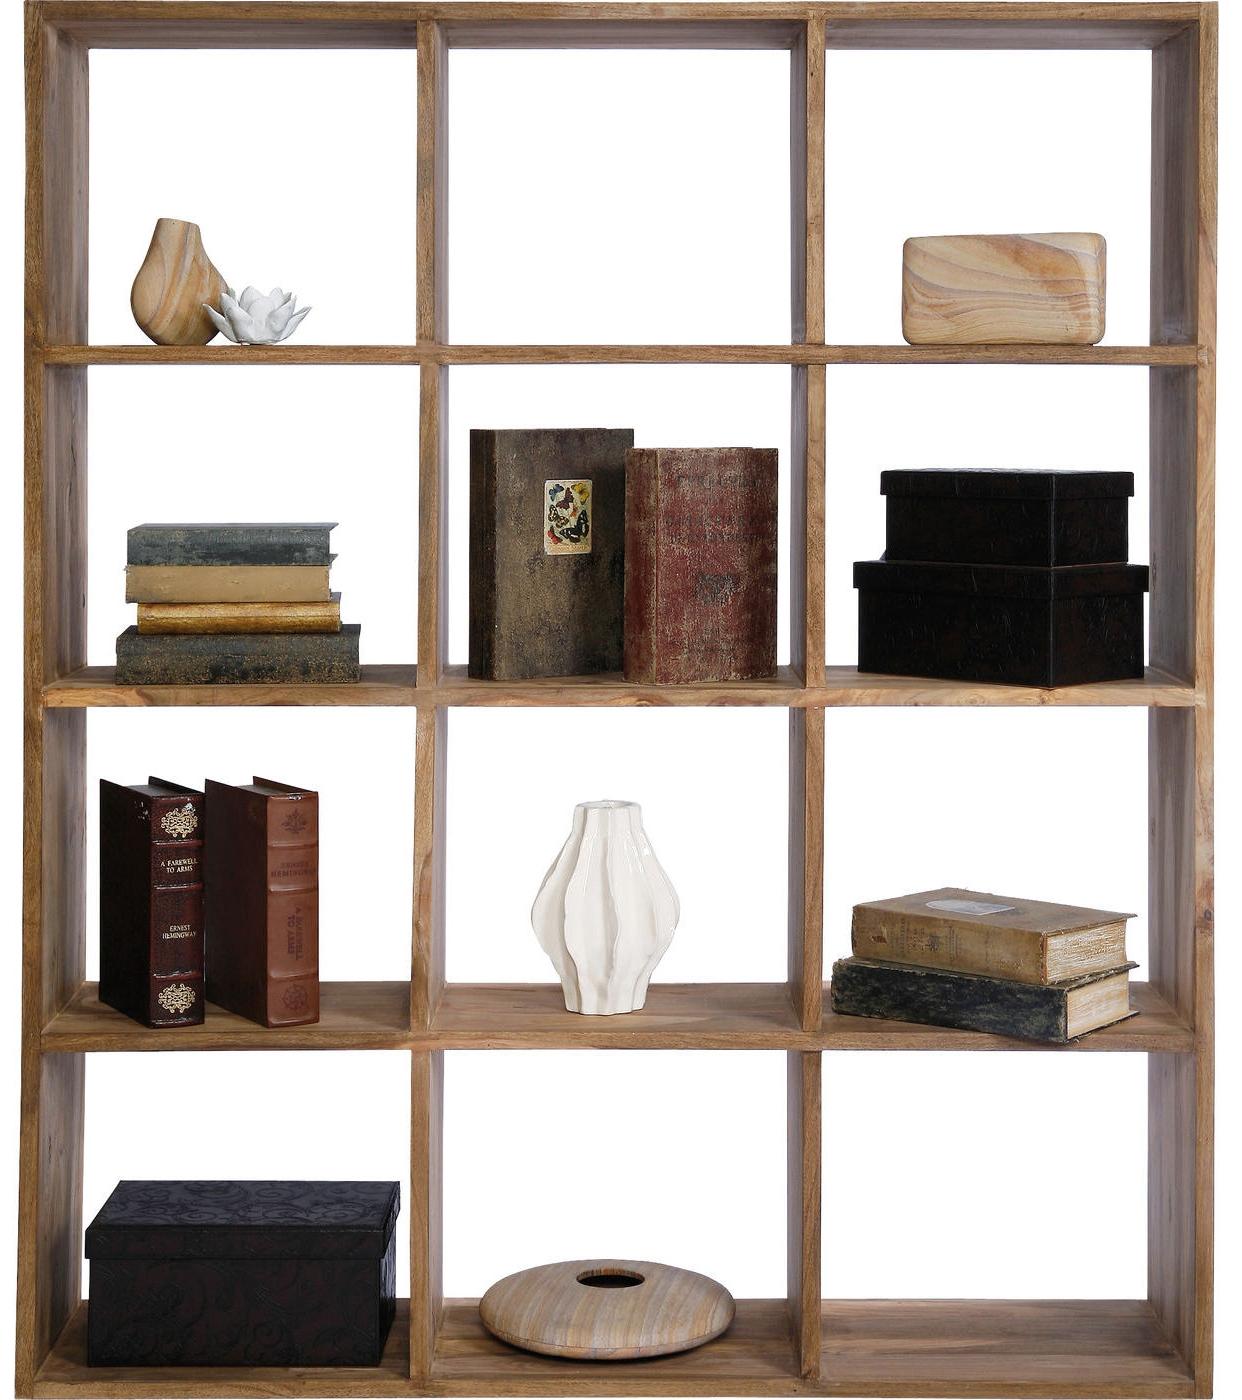 Kare design tv meubel authentico club l120 x b40 x h43 cm massief sheesham hout aanbieding kopen - Massief sheesham ...